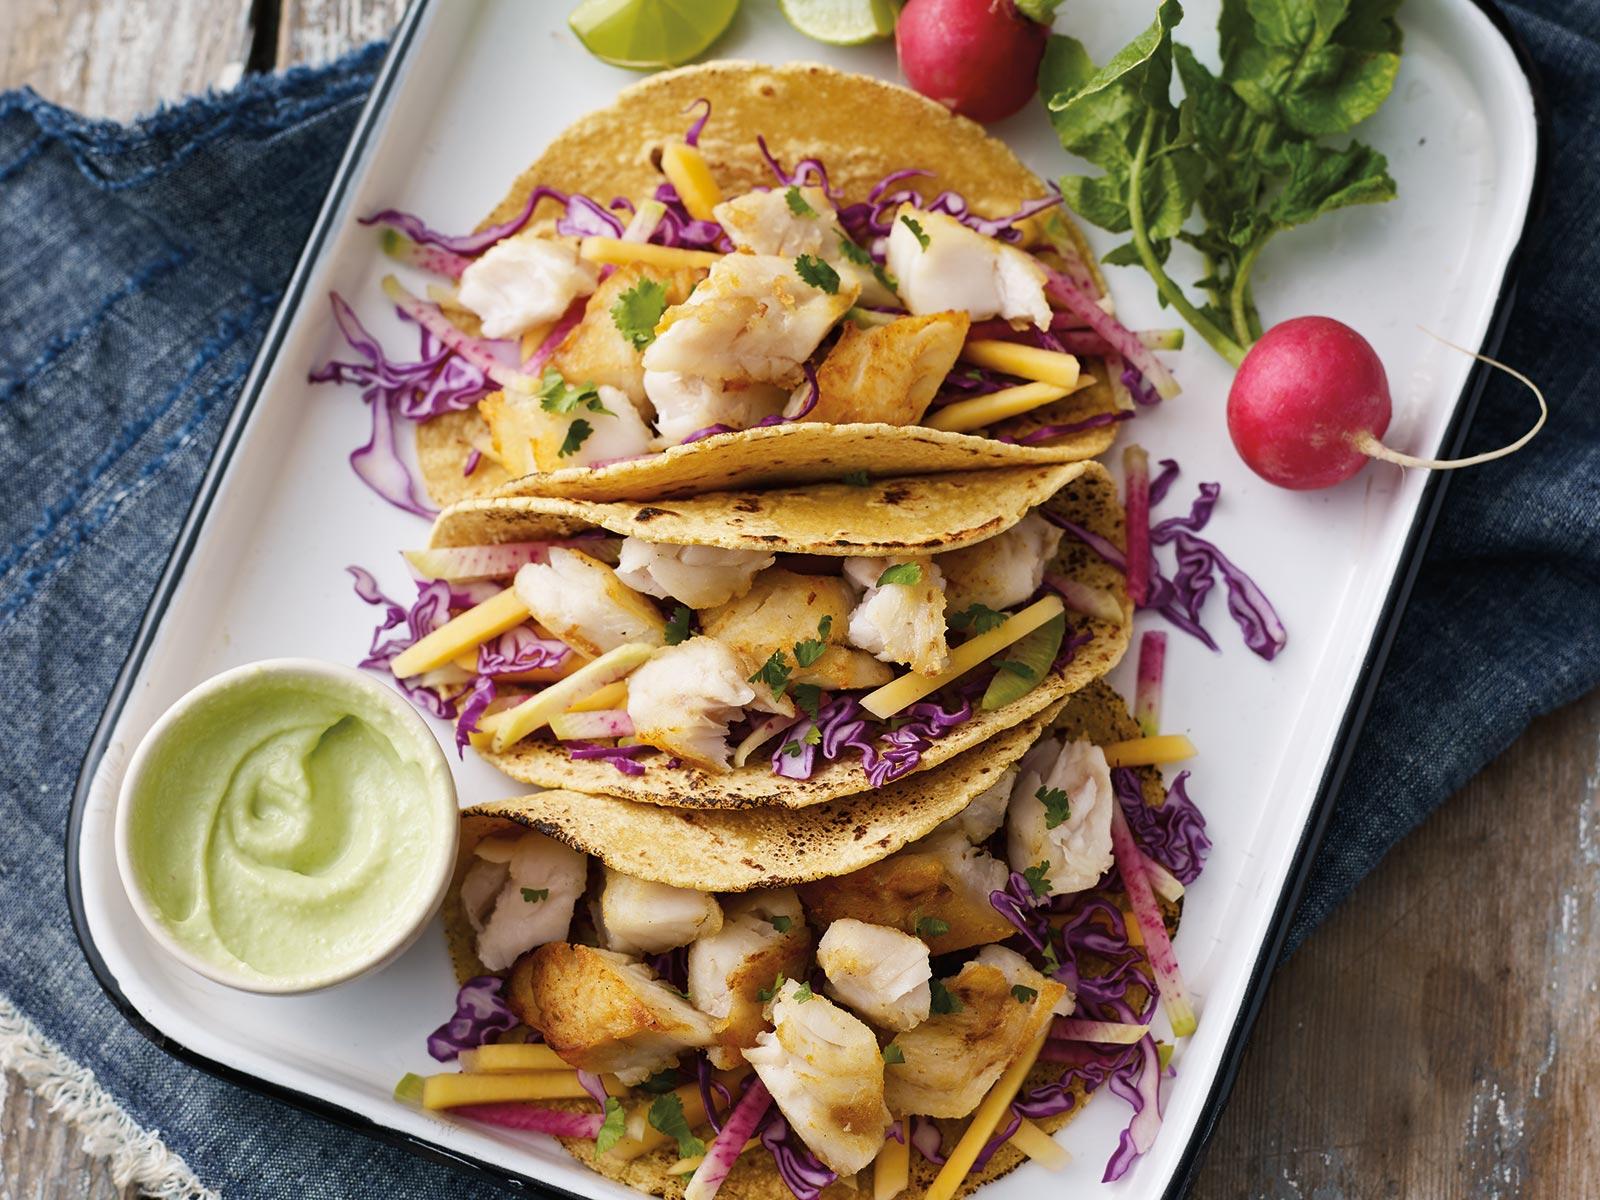 Asian Fusion Wild Alaska Pollock Tacos